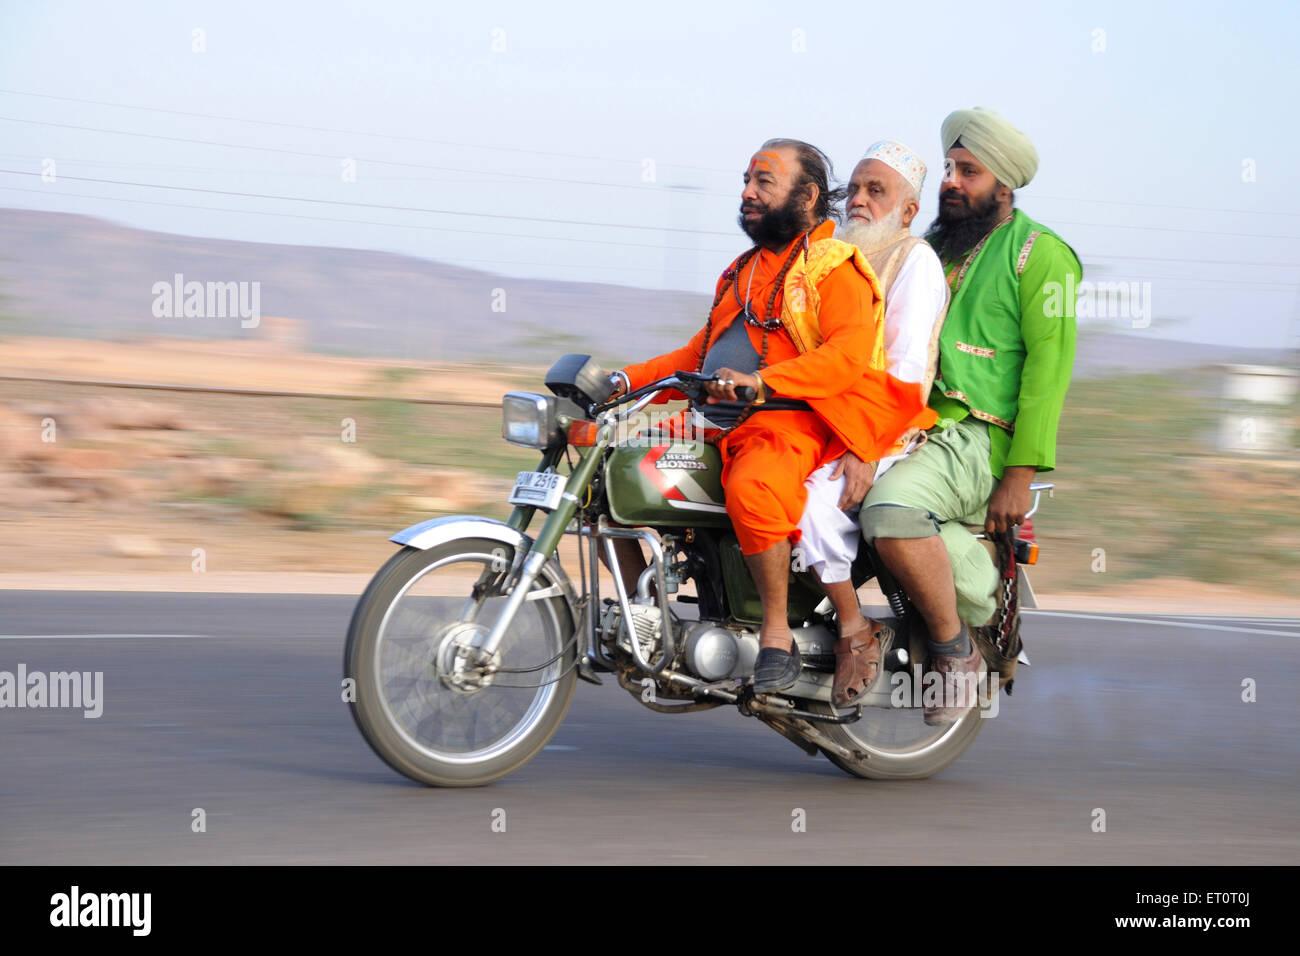 Men on motorbike NOMR - Stock Image